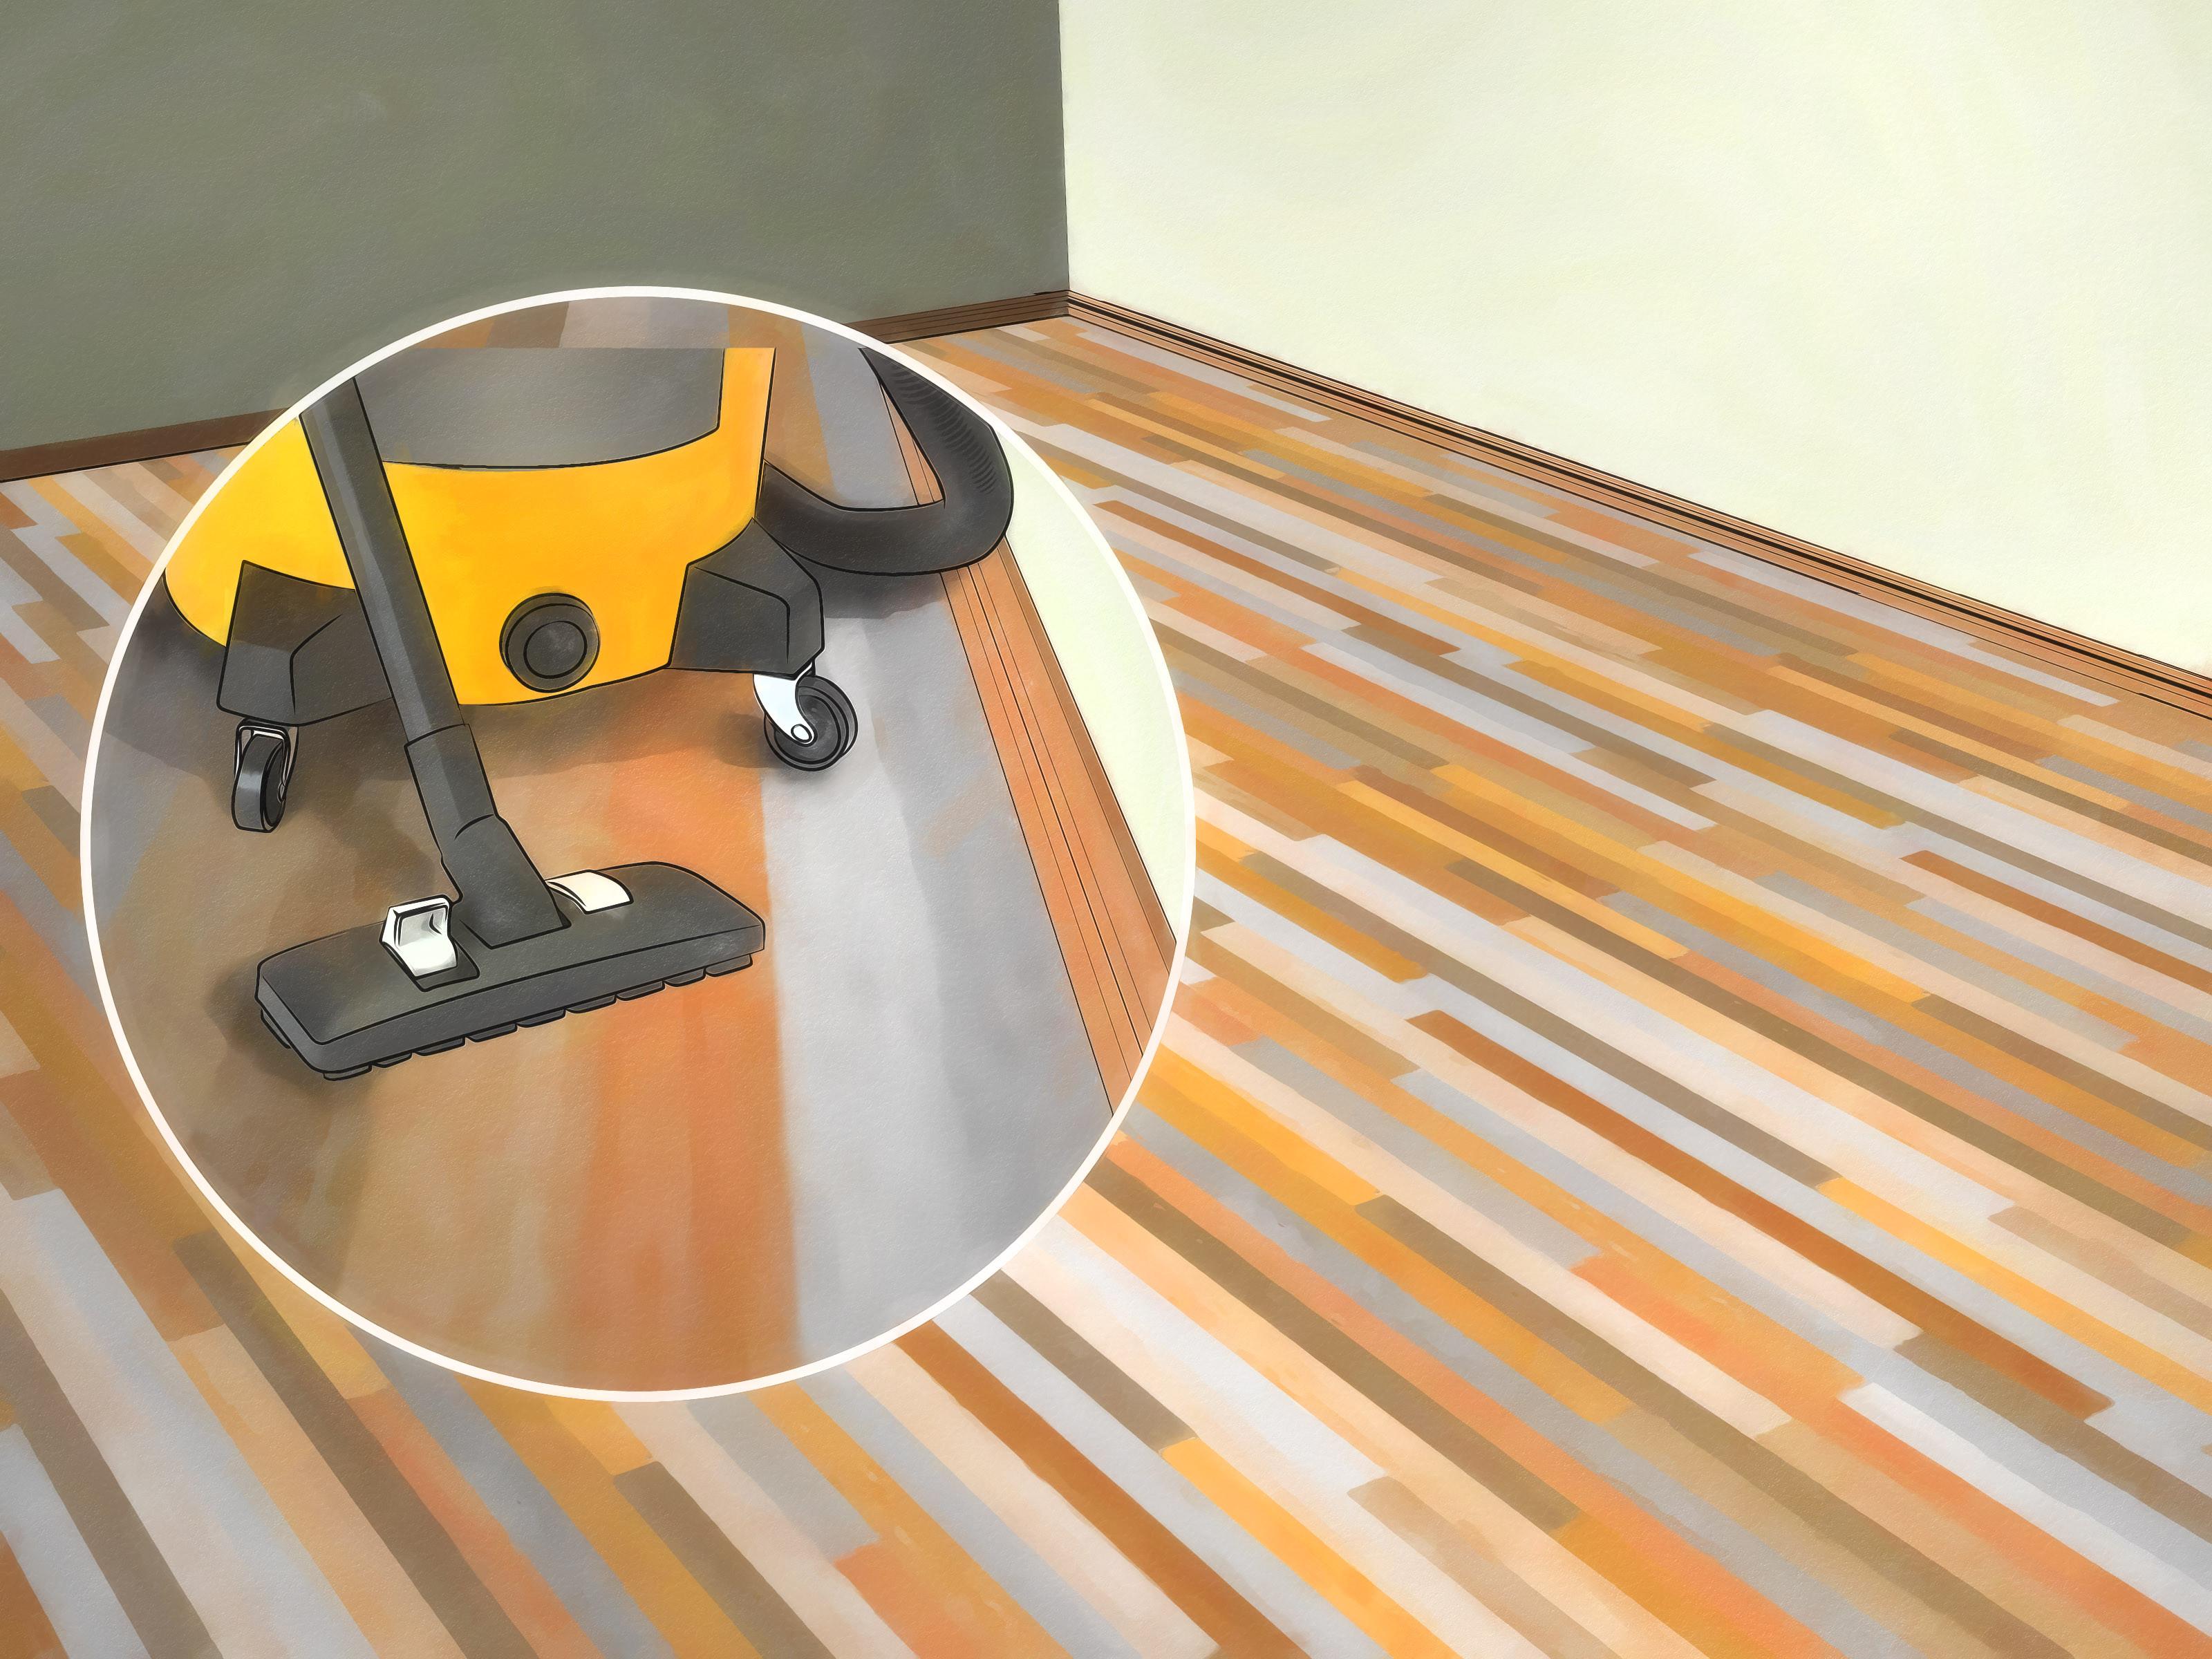 old hardwood floors of how to sand hardwood floors with pictures wikihow for sand hardwood floors step 22